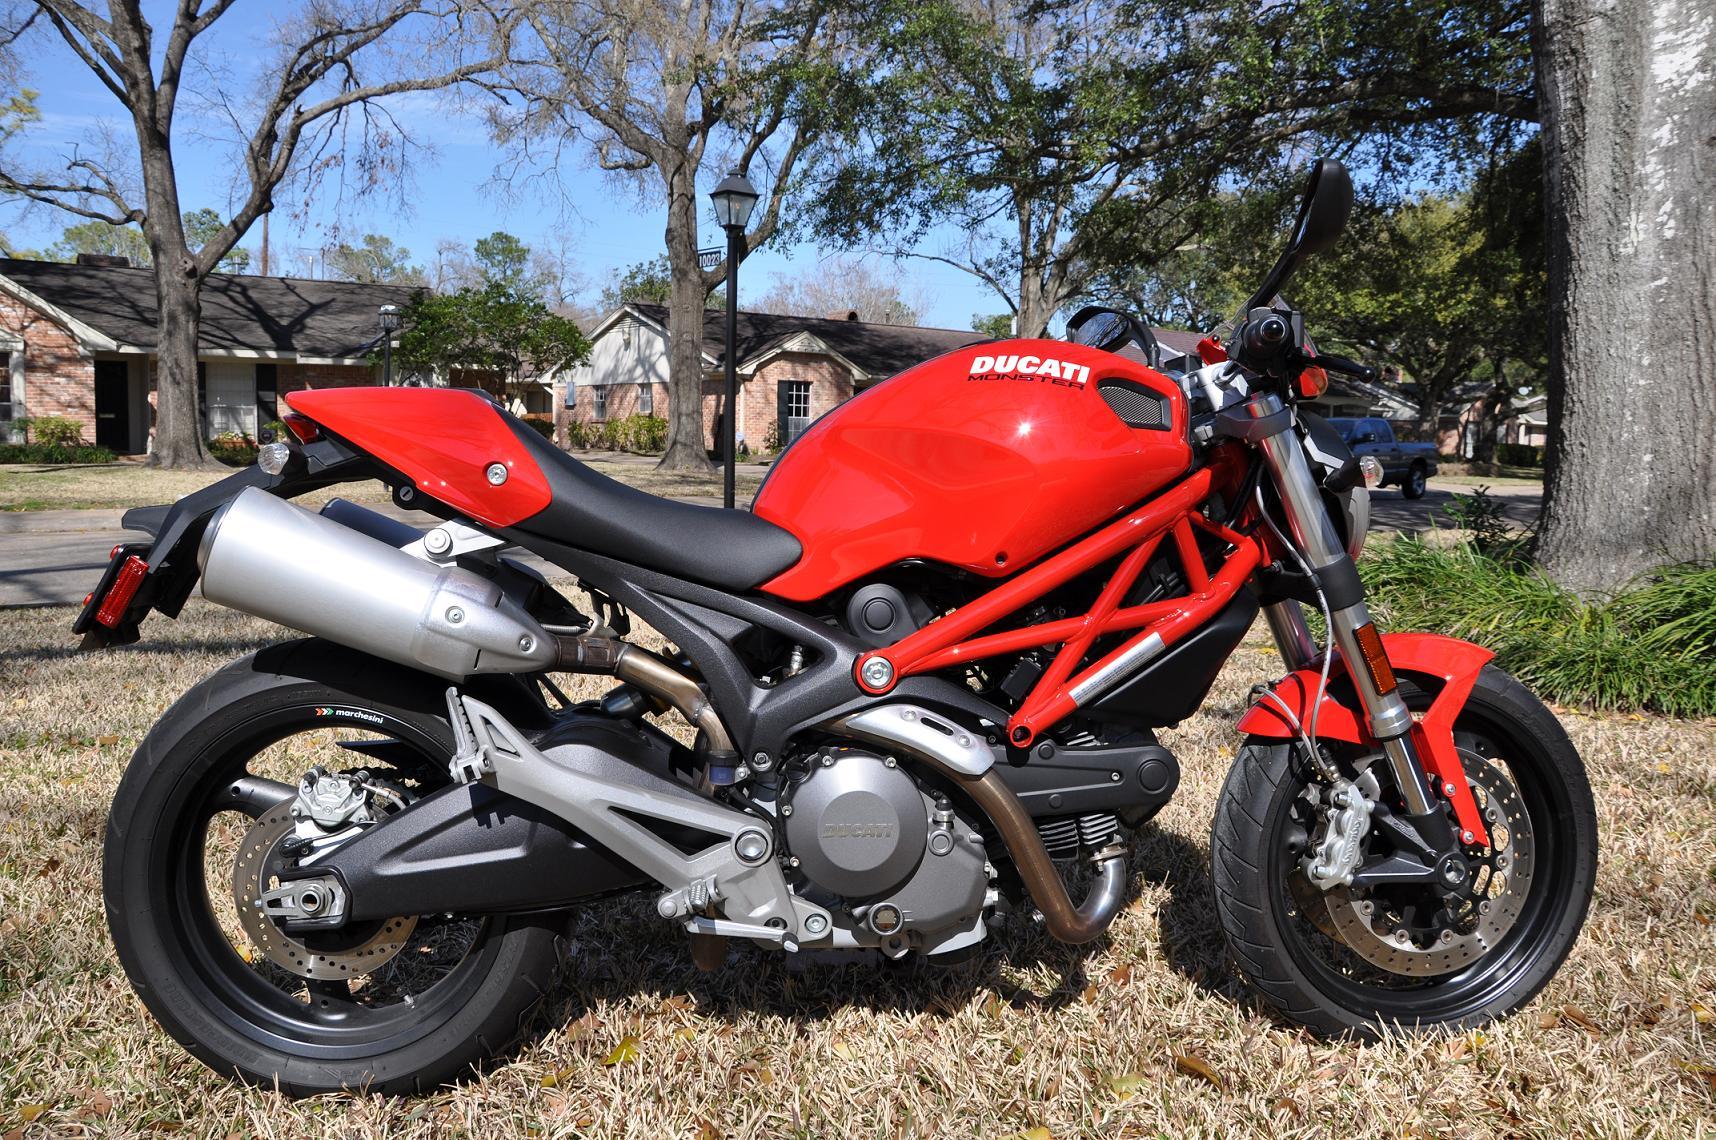 For Sale: 2008 Ducati Monster 696+ - Ducati.ms - The